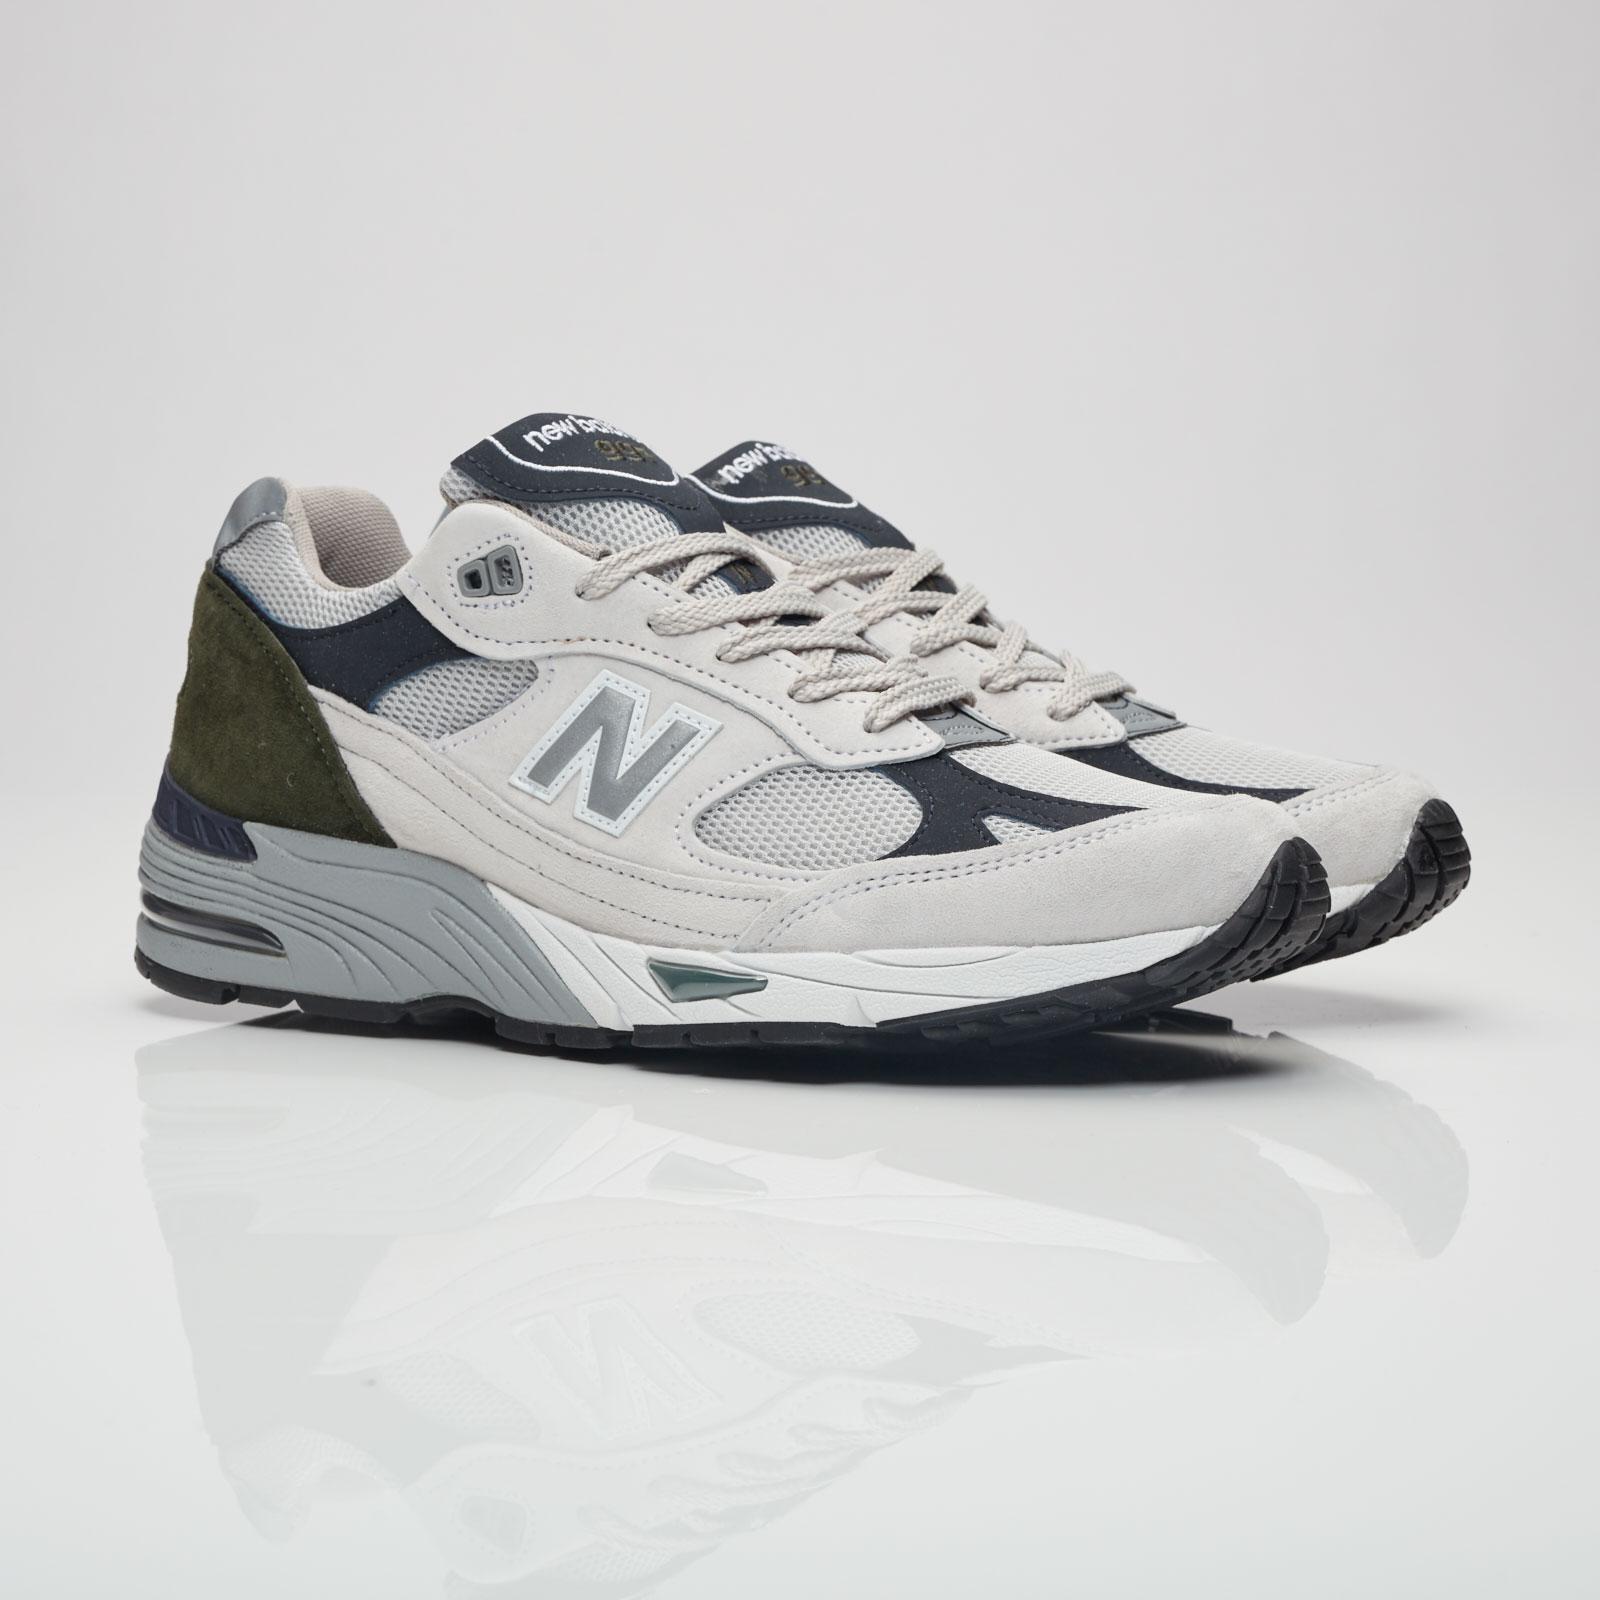 new balance m991